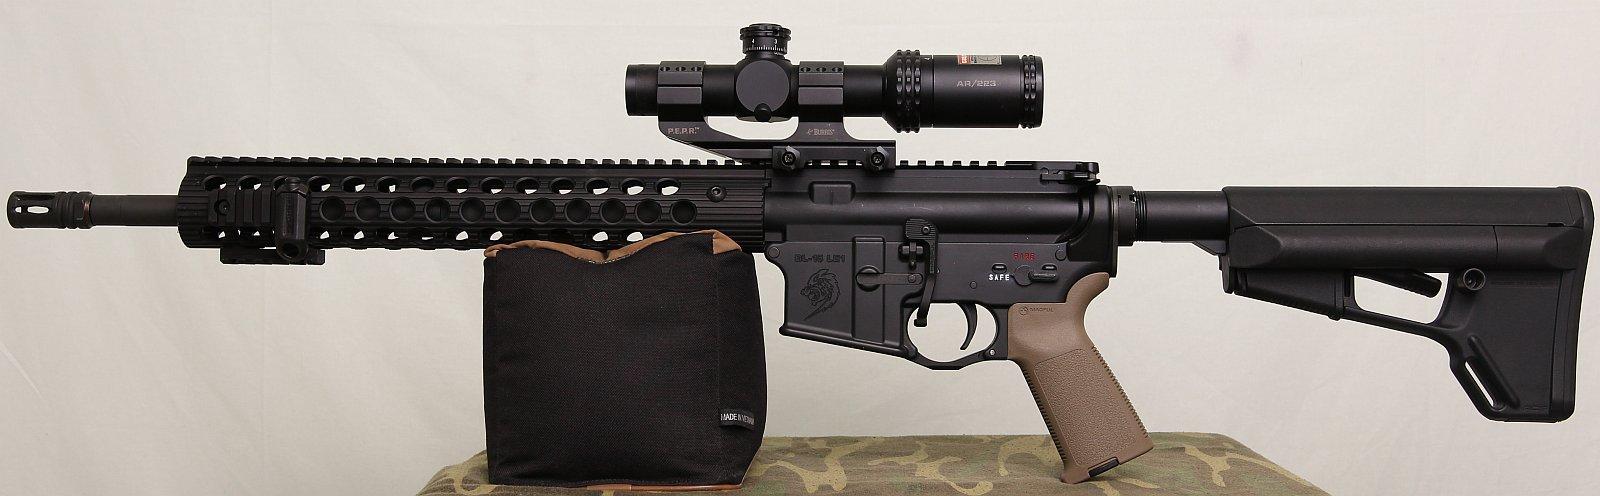 3gun in canada the hunting gear guy